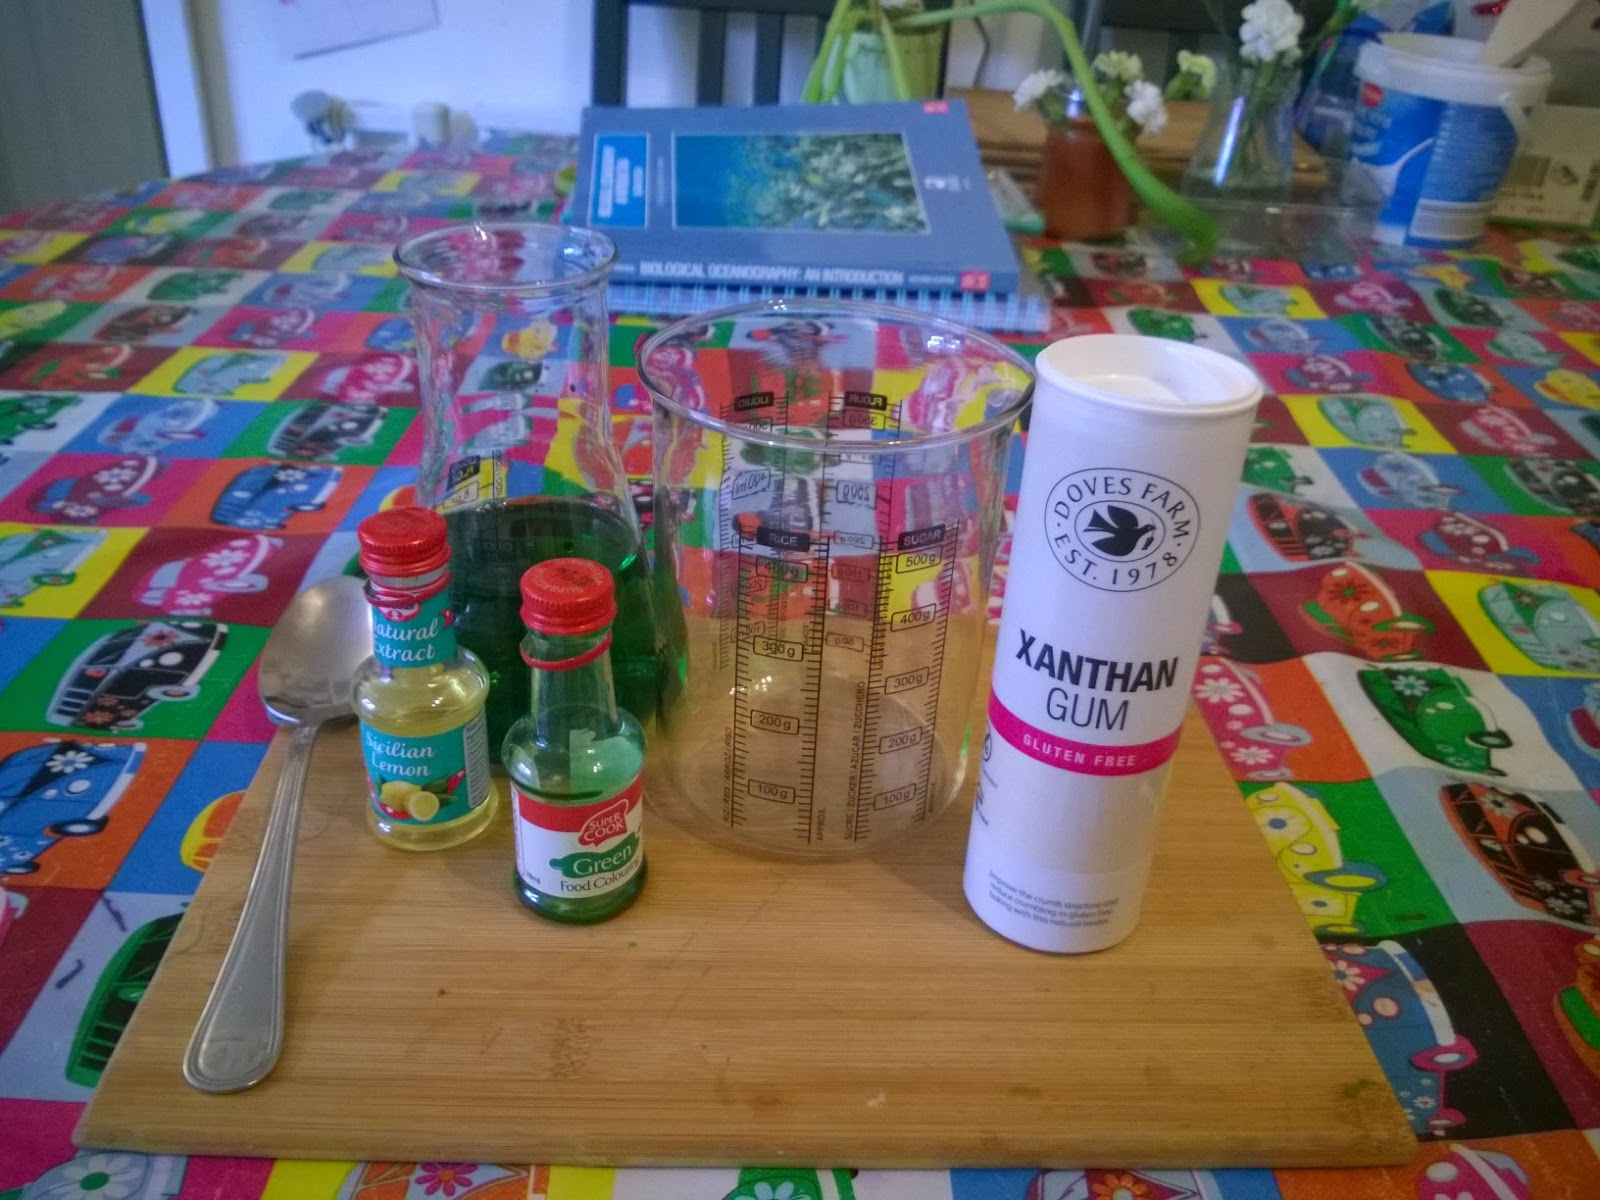 Xanthan Gum Recipes The Maz Shack (...